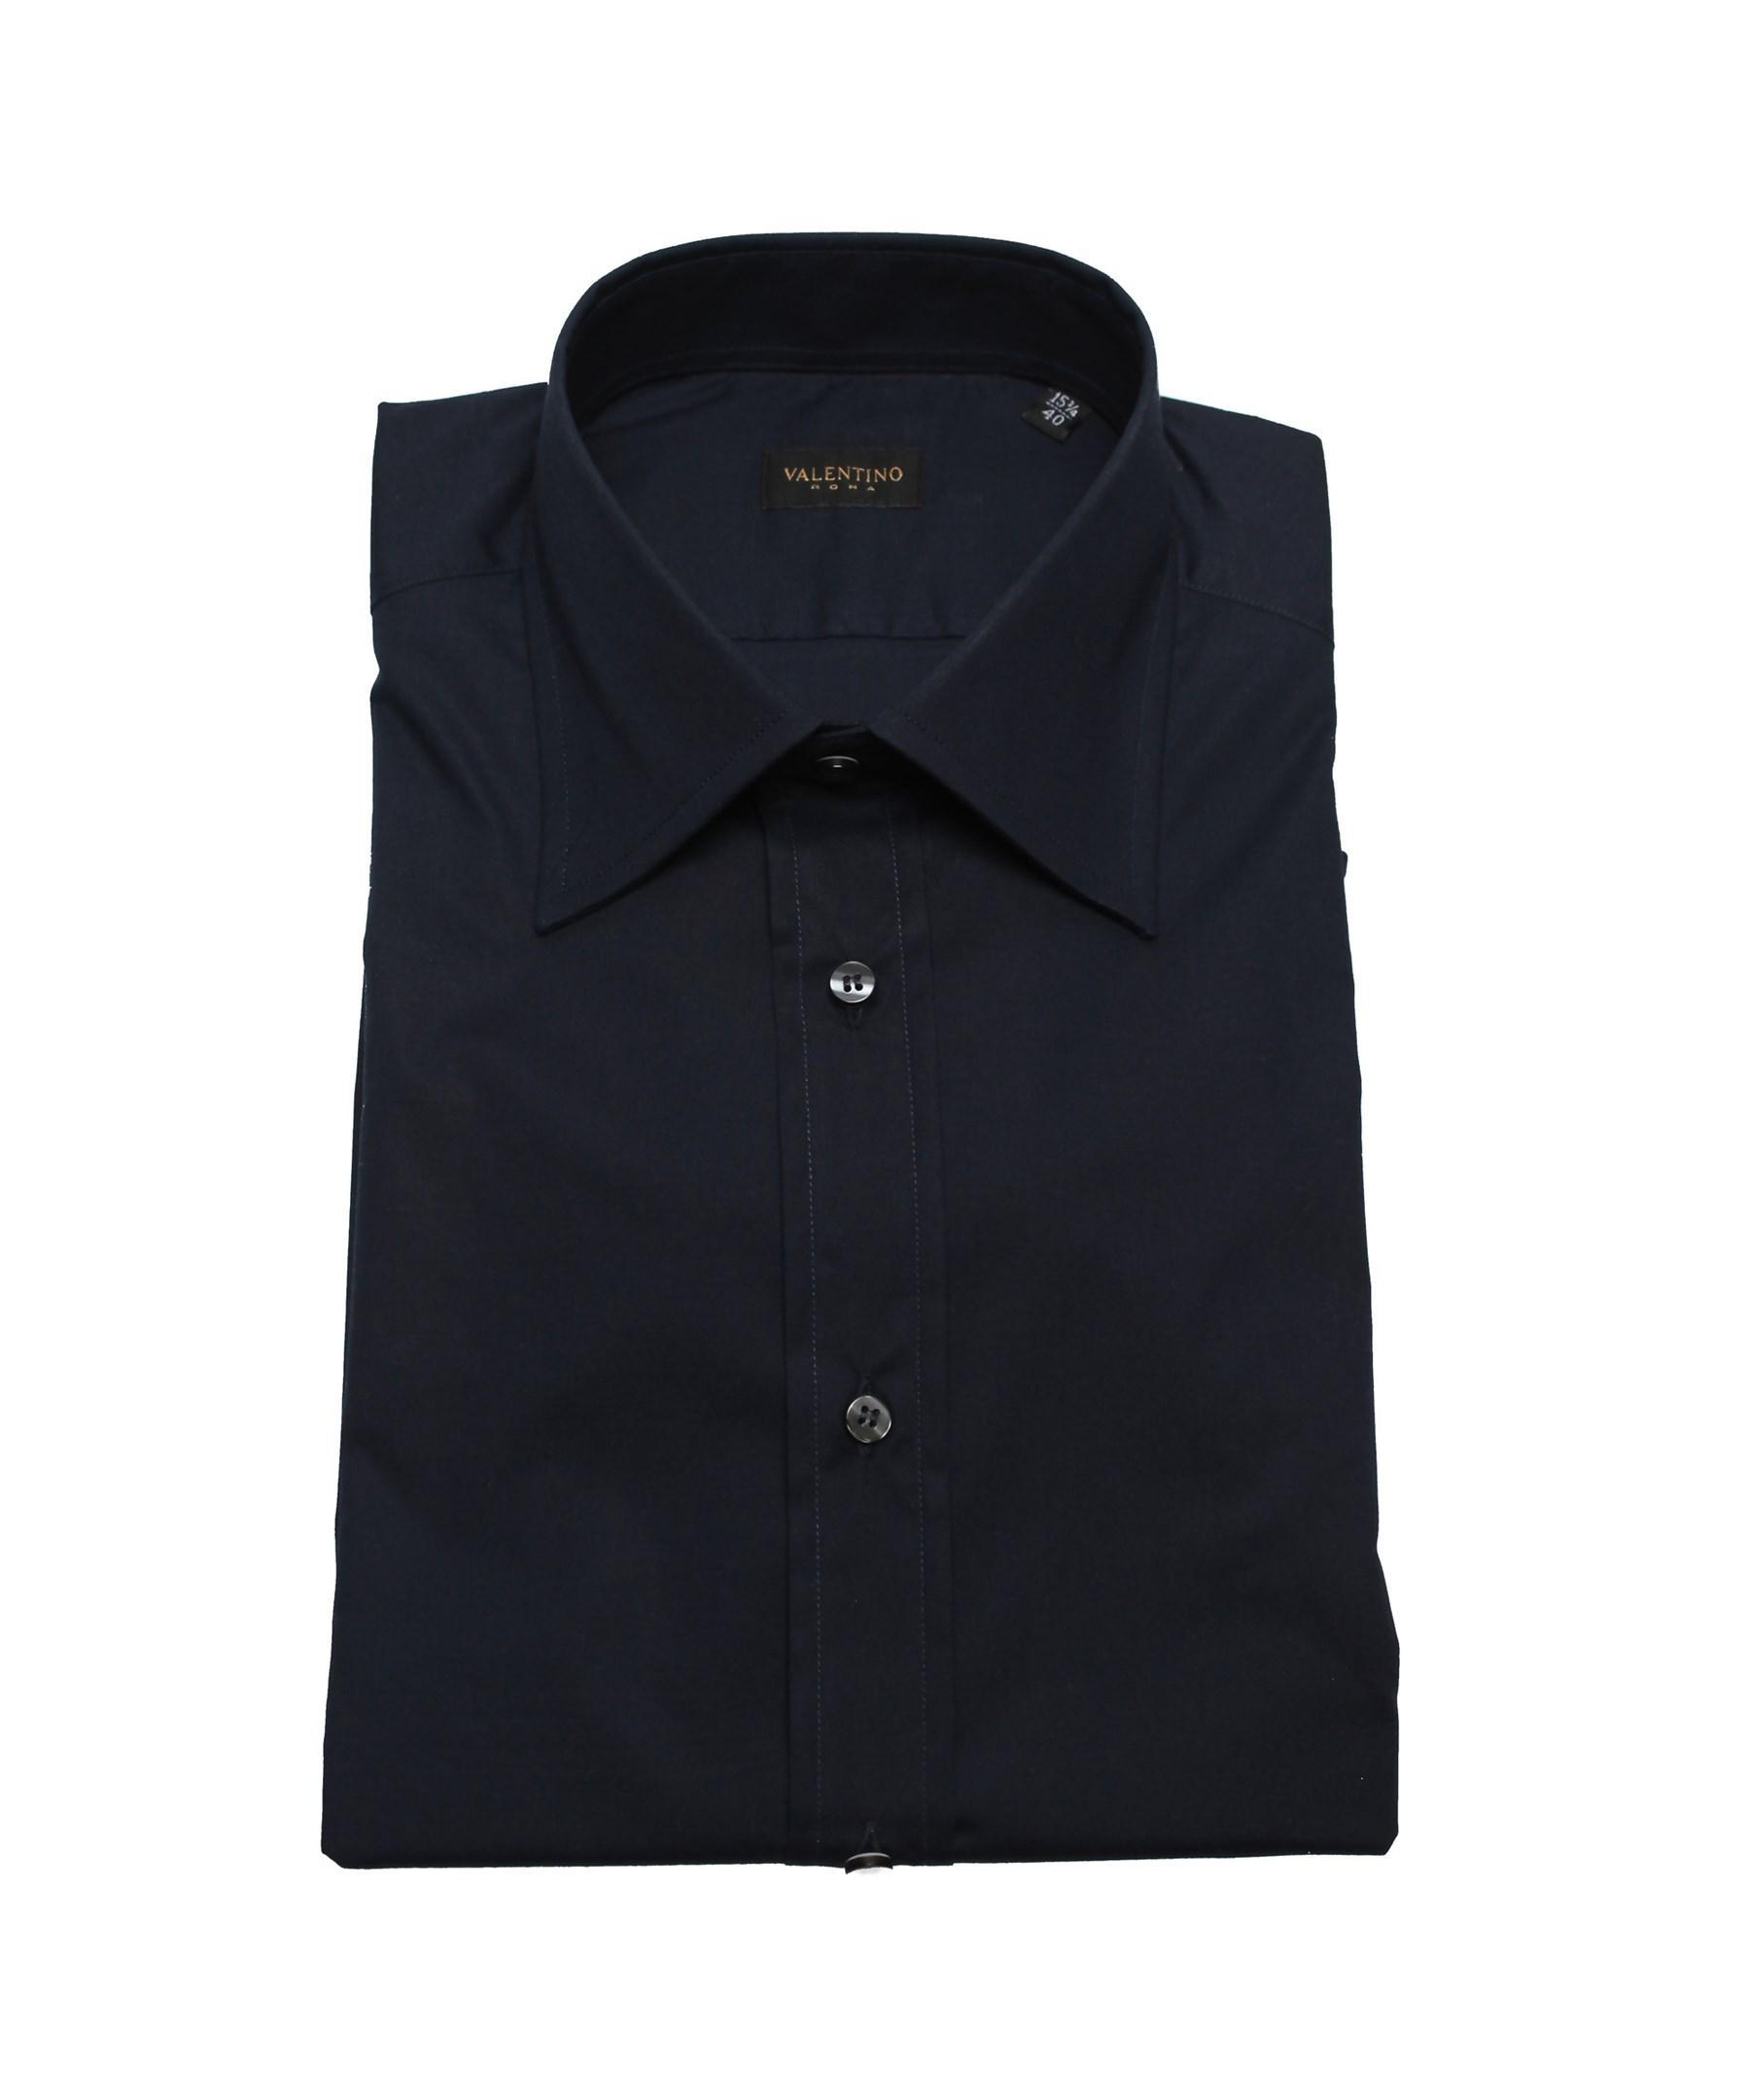 Valentino regular fit cotton dress shirt navy in blue for for Regular fit dress shirt